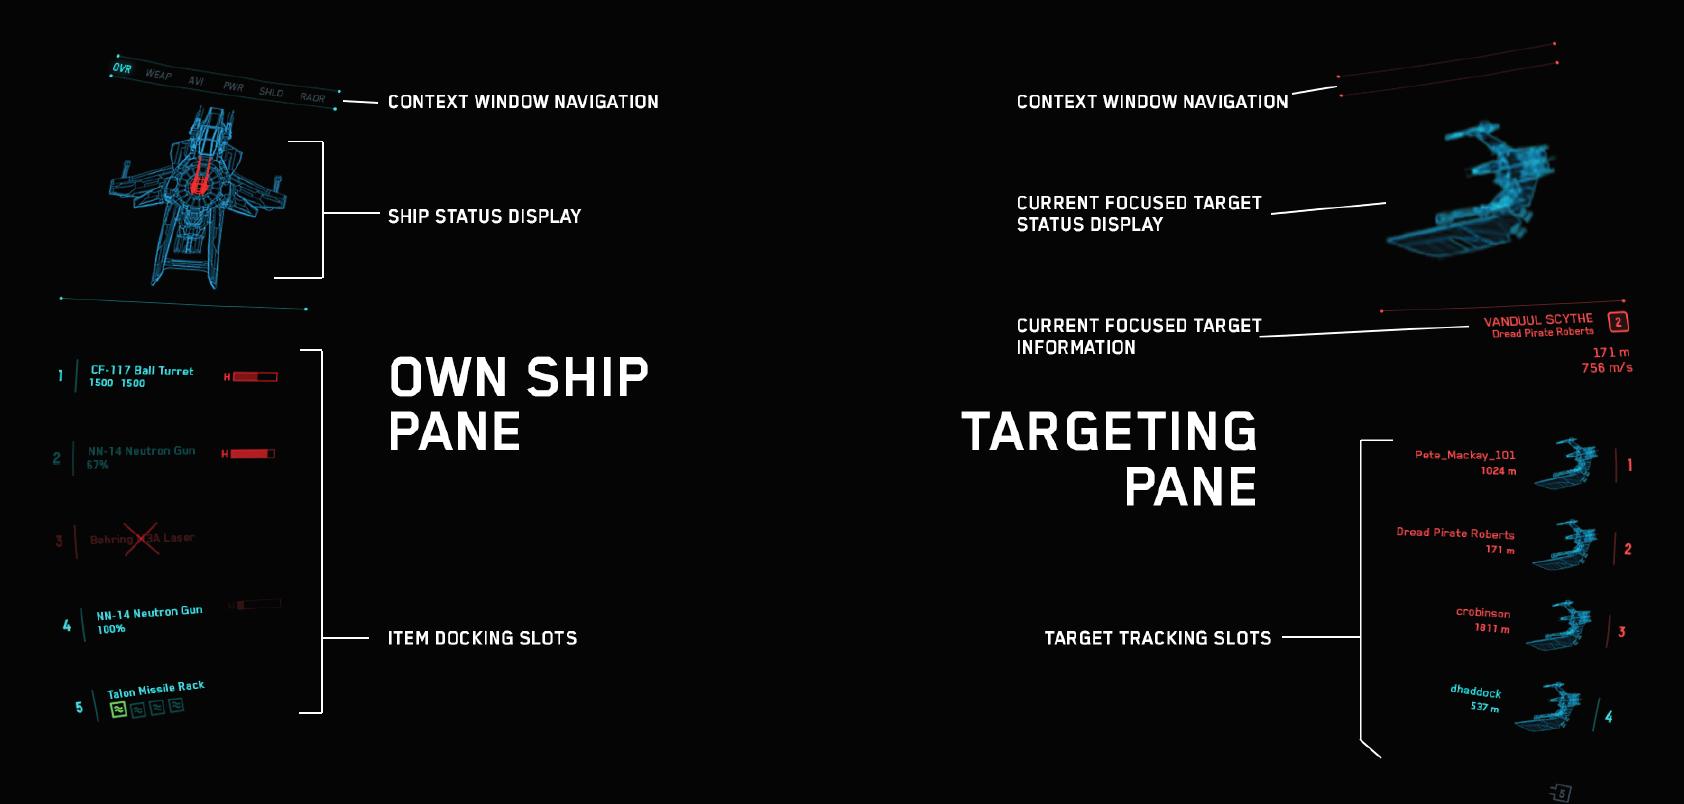 Интерфейс боевого визора